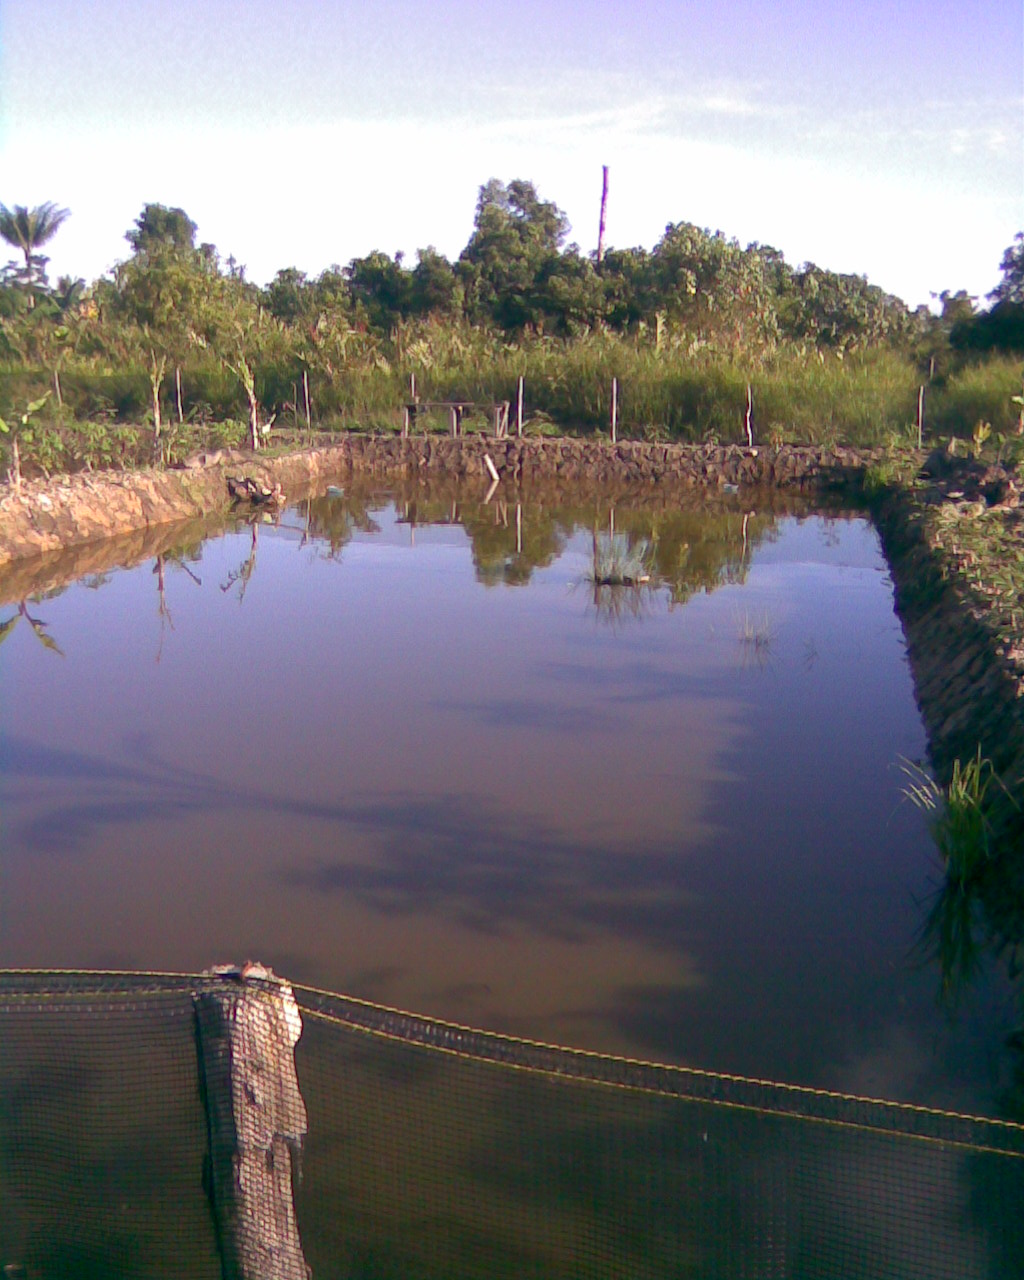 Gallery kelinjau: Foto Tambak Ikan, Budidaya Ikan Nila